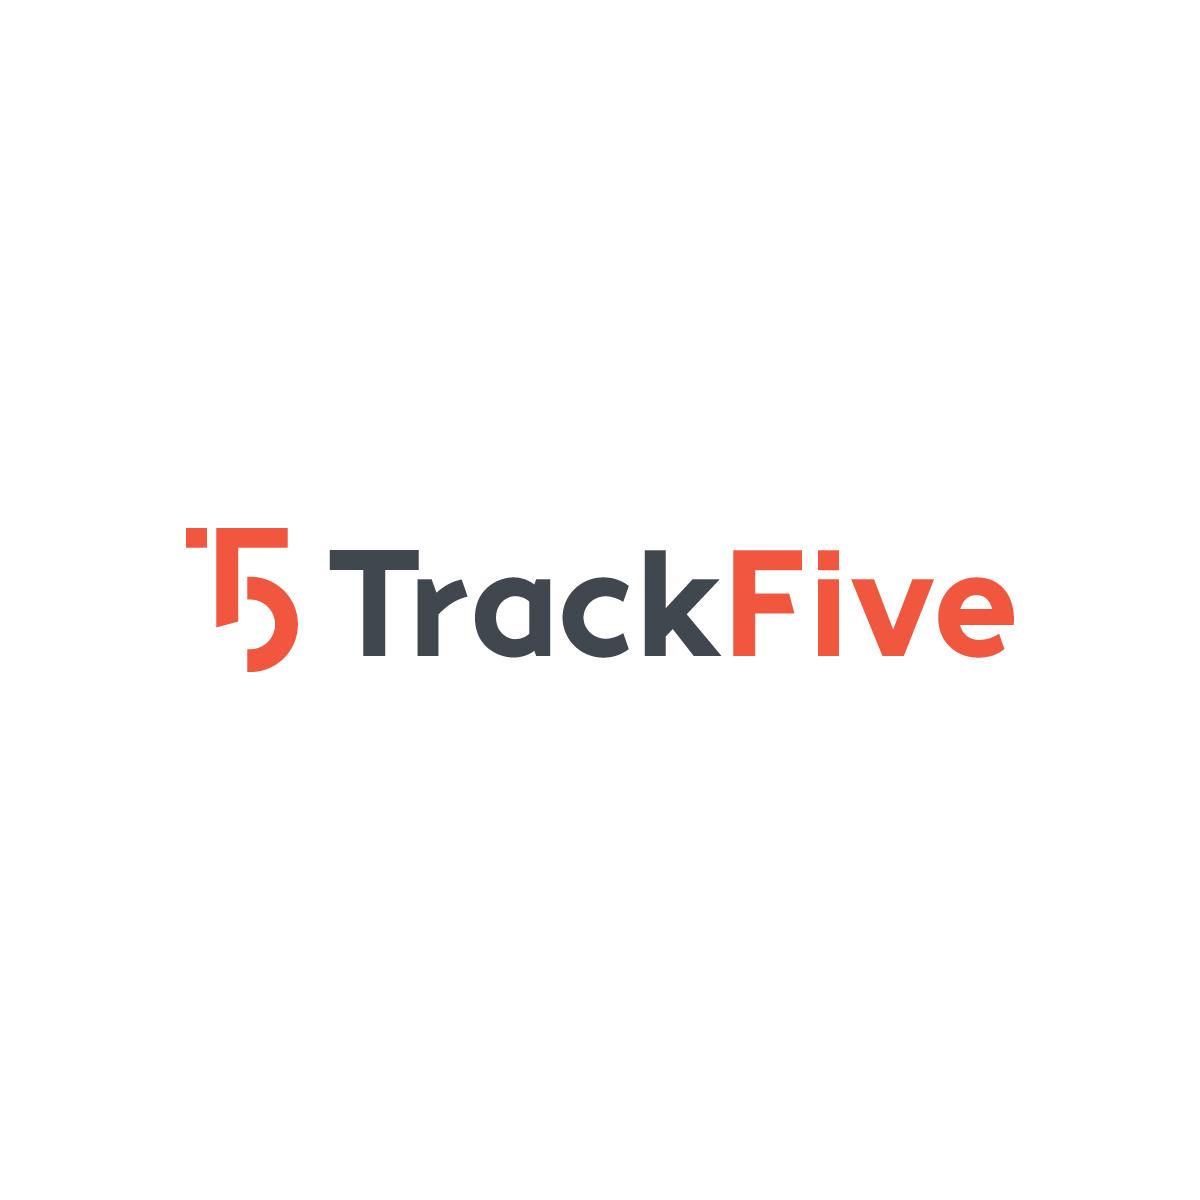 TrackFive